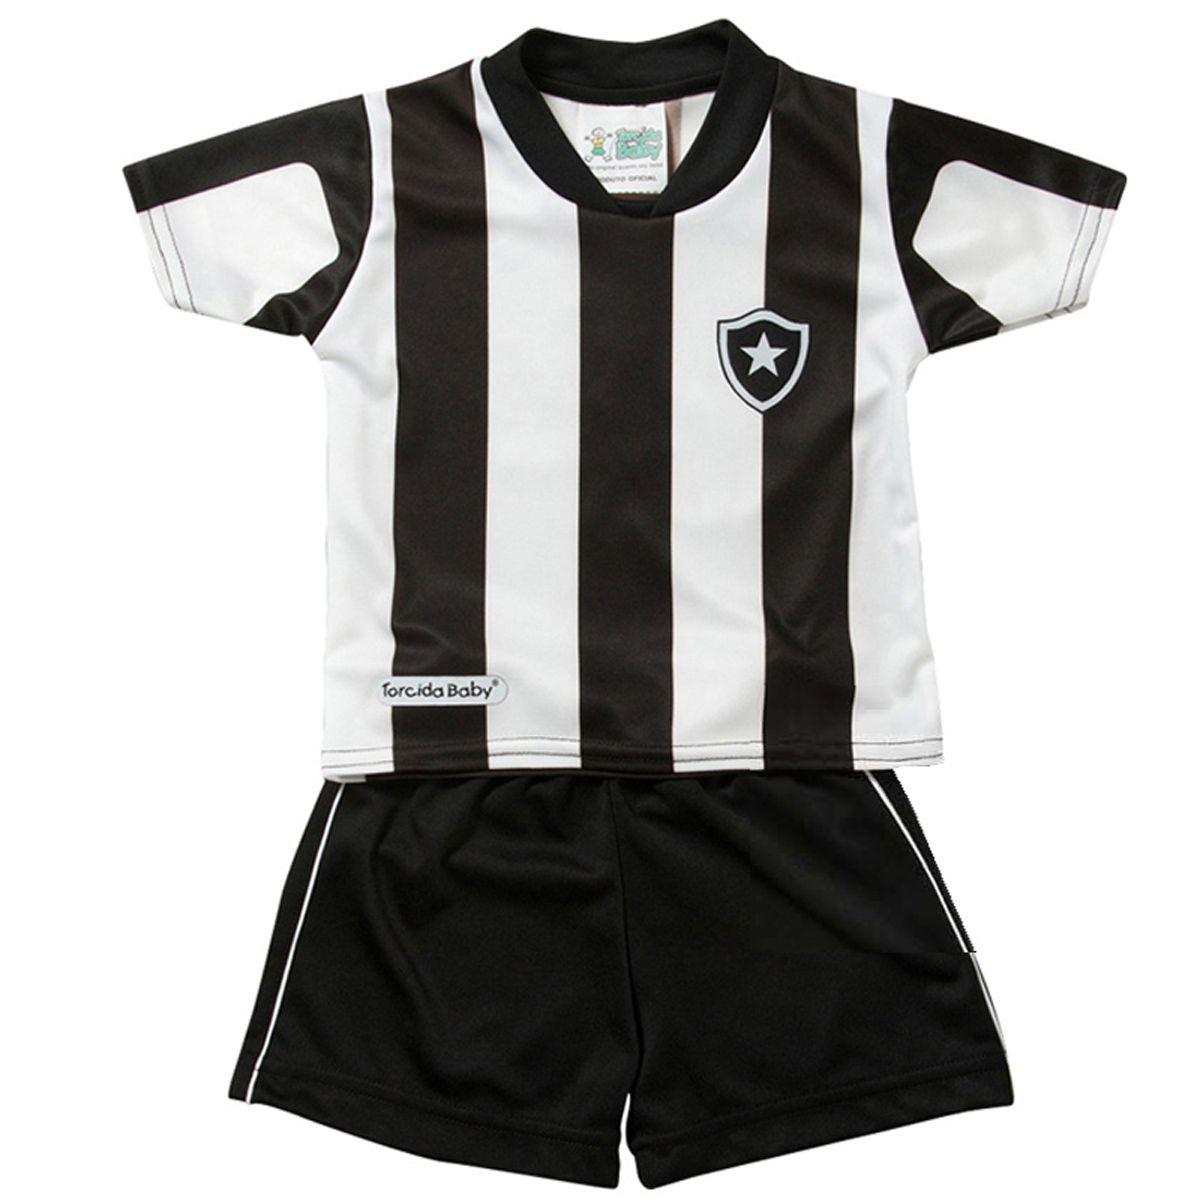 Kit Uniforme Bebê do Botafogo Torcida Baby - 015S